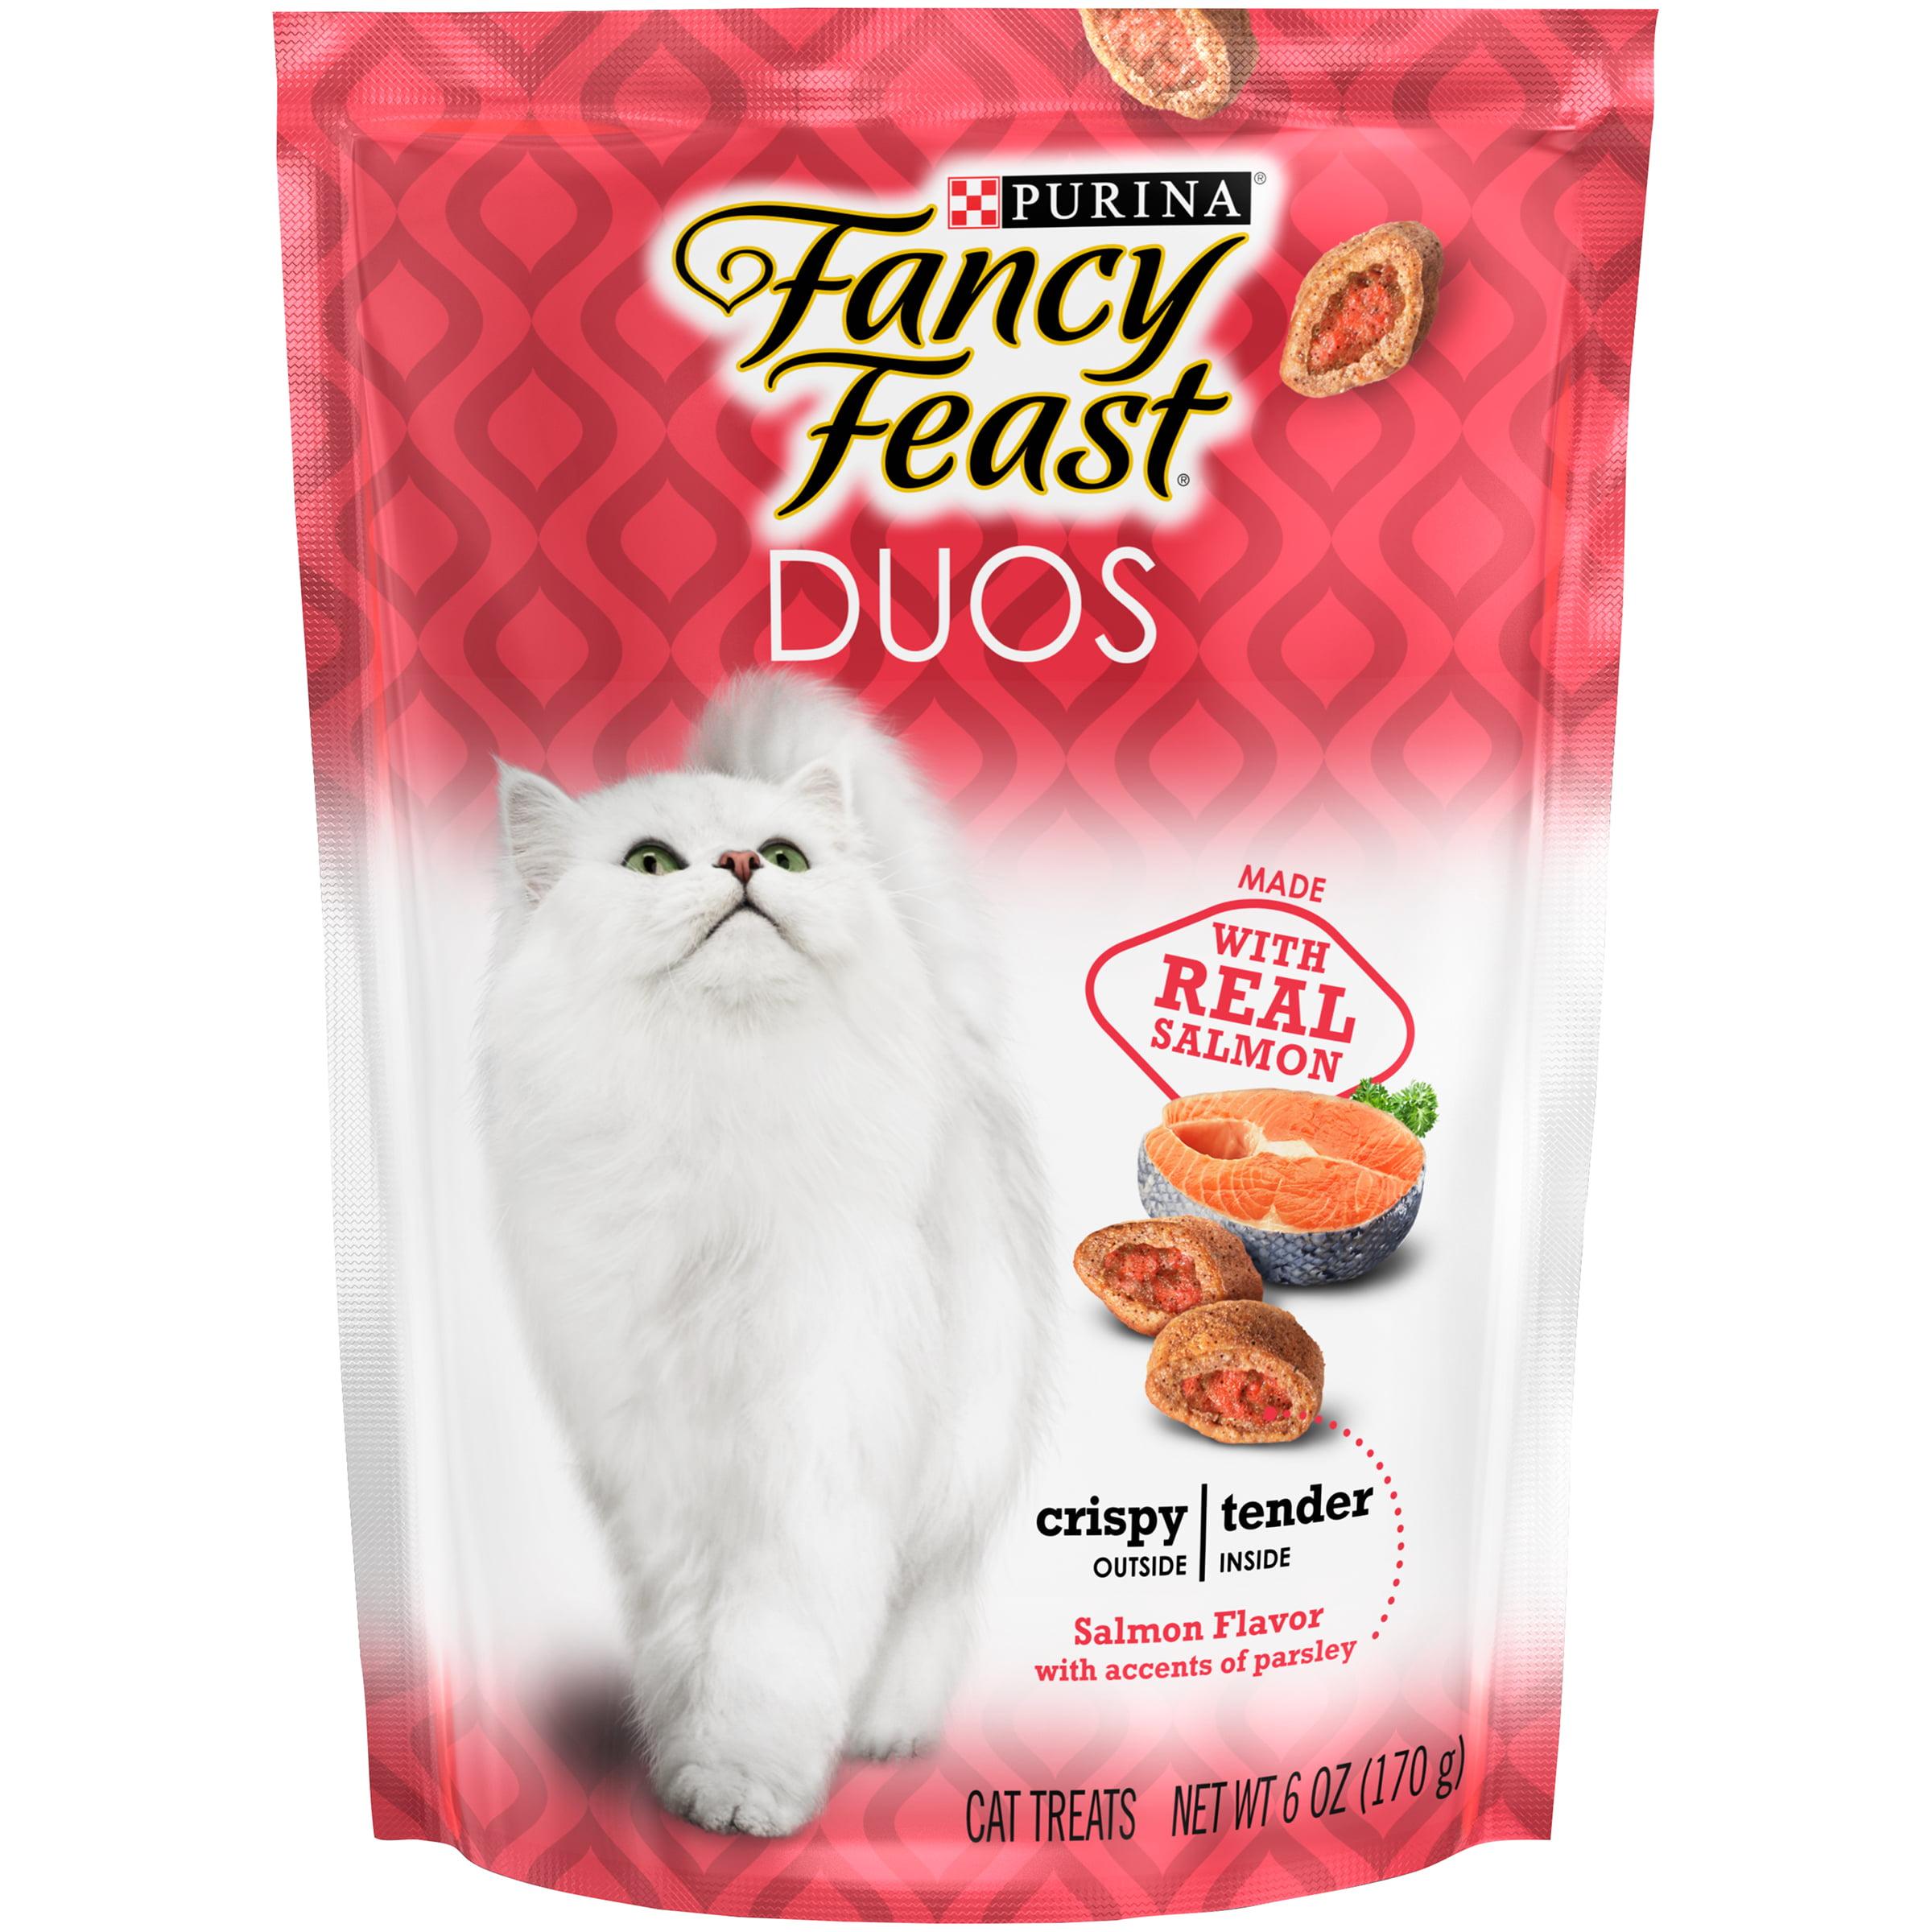 Purina Fancy Feast Duos Salmon Flavor Cat Treats, 6 oz.